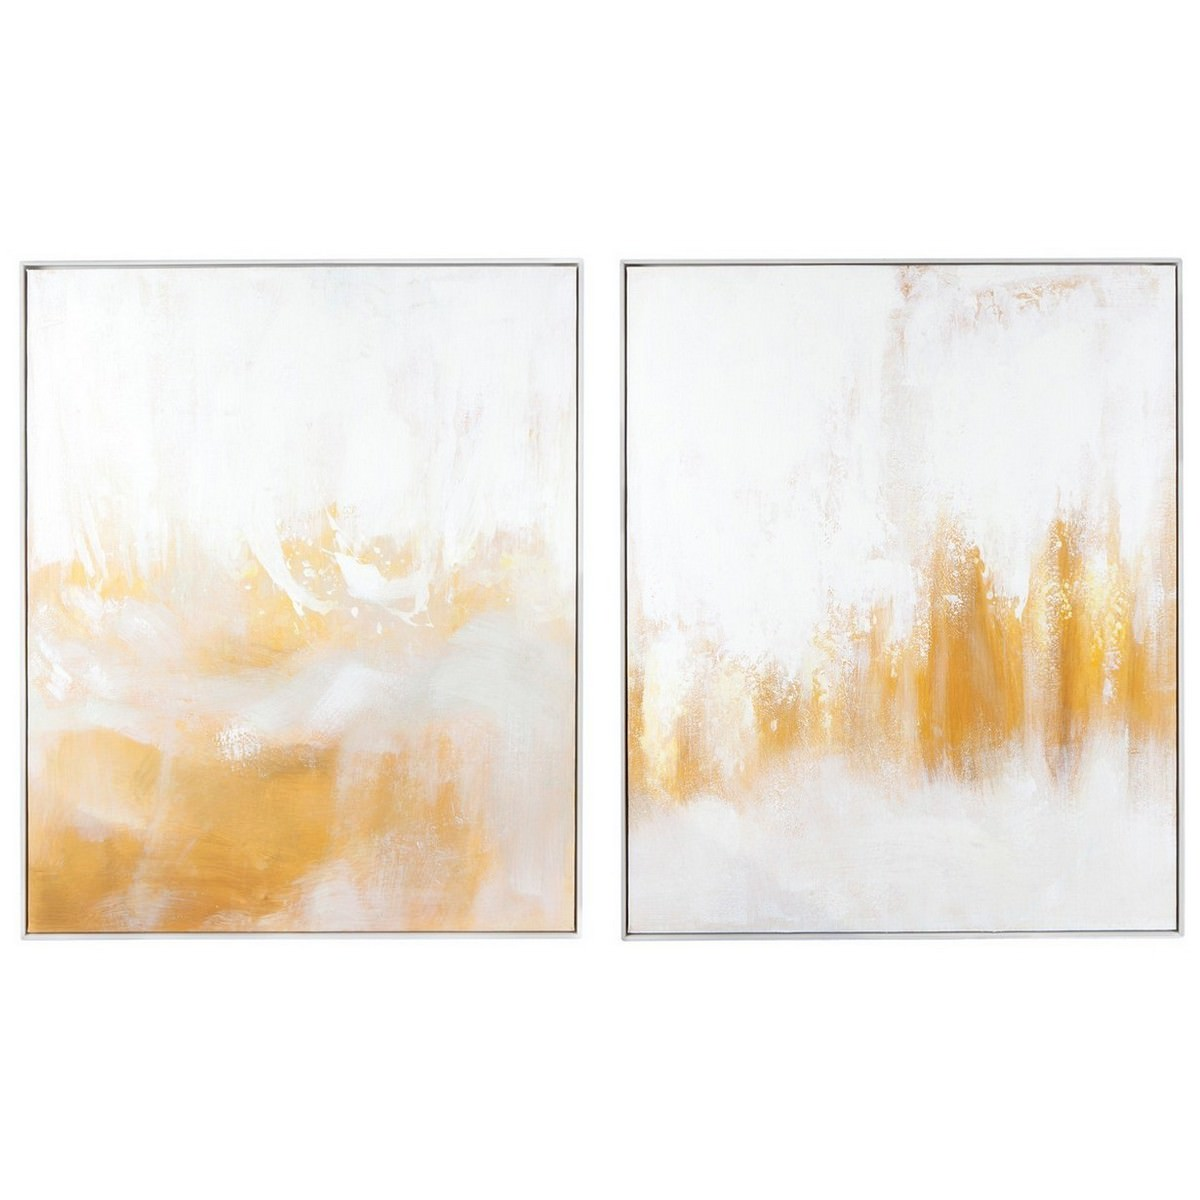 Gold Lustre 2 Piece Framed Canvas Painting Wall Art Set, 120cm